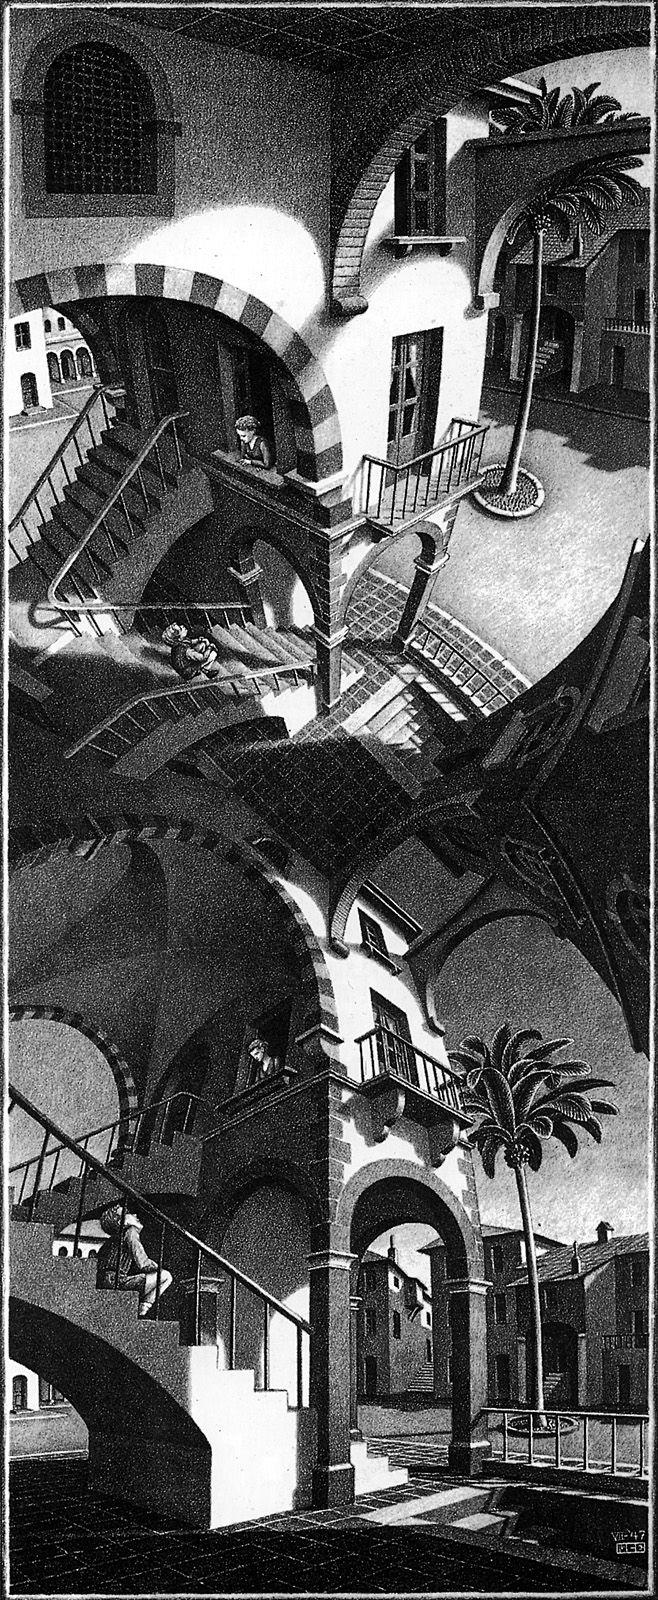 M. C. Escher - High And Low